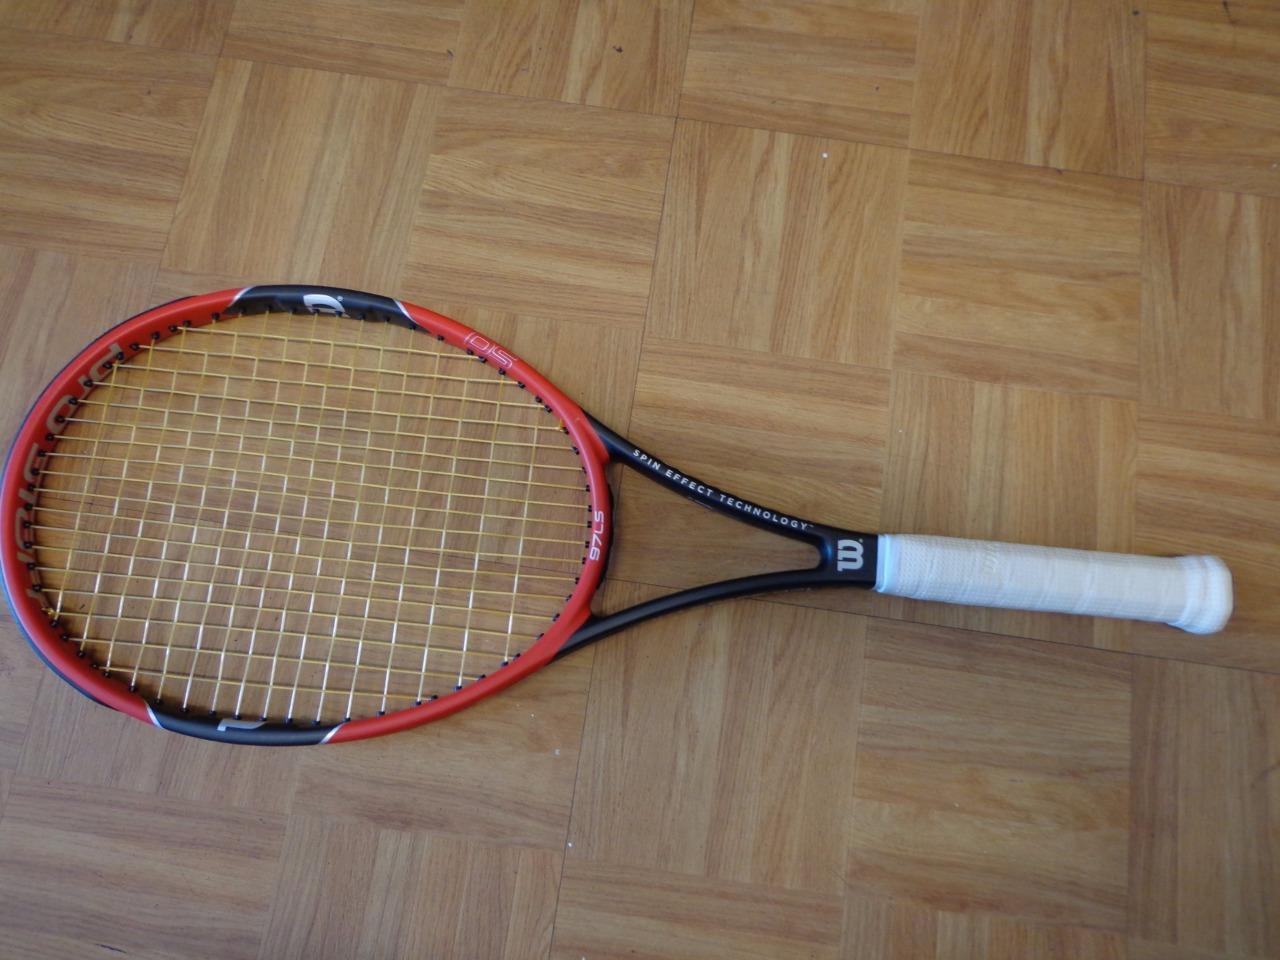 2015 Pro Staff Wilson 97LS 10.2oz 18x16 4 1 2 Grip Tenis Raqueta